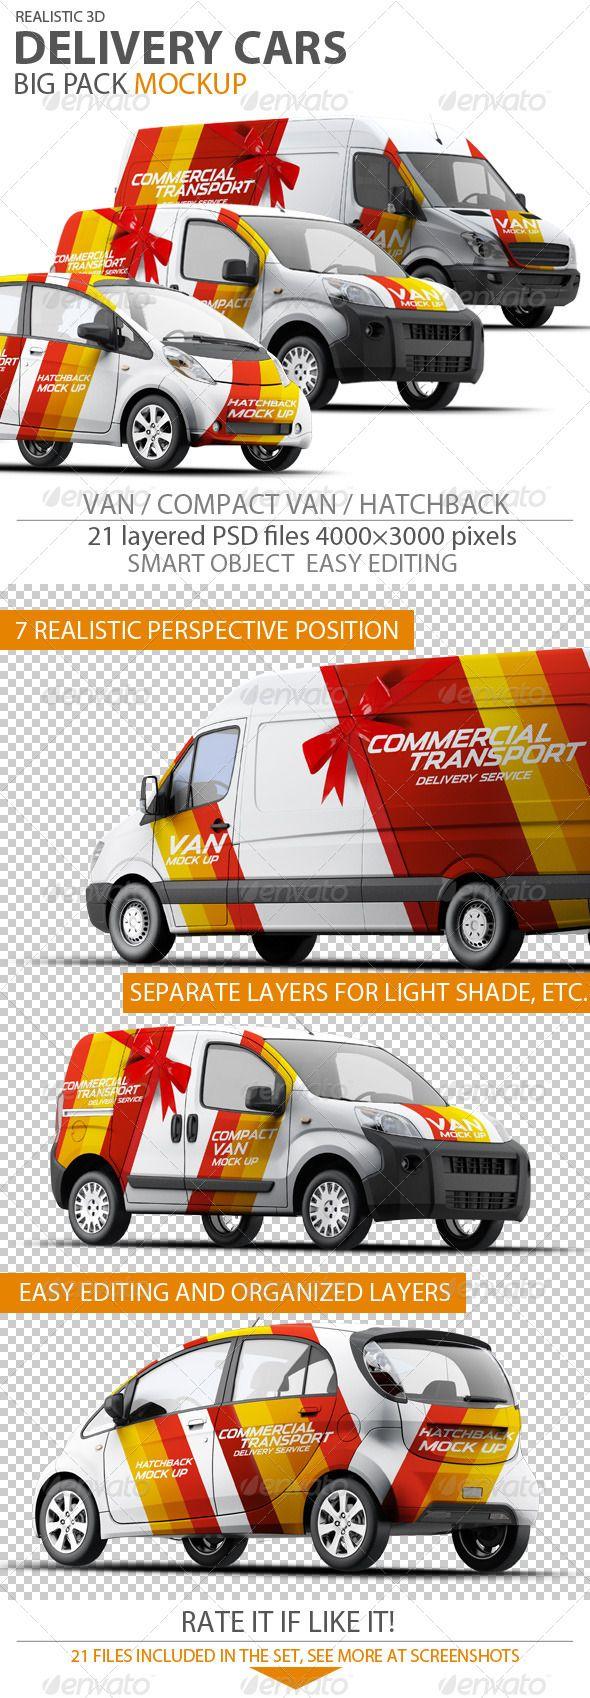 Car sticker design psd - Car Sticker Design Psd 1